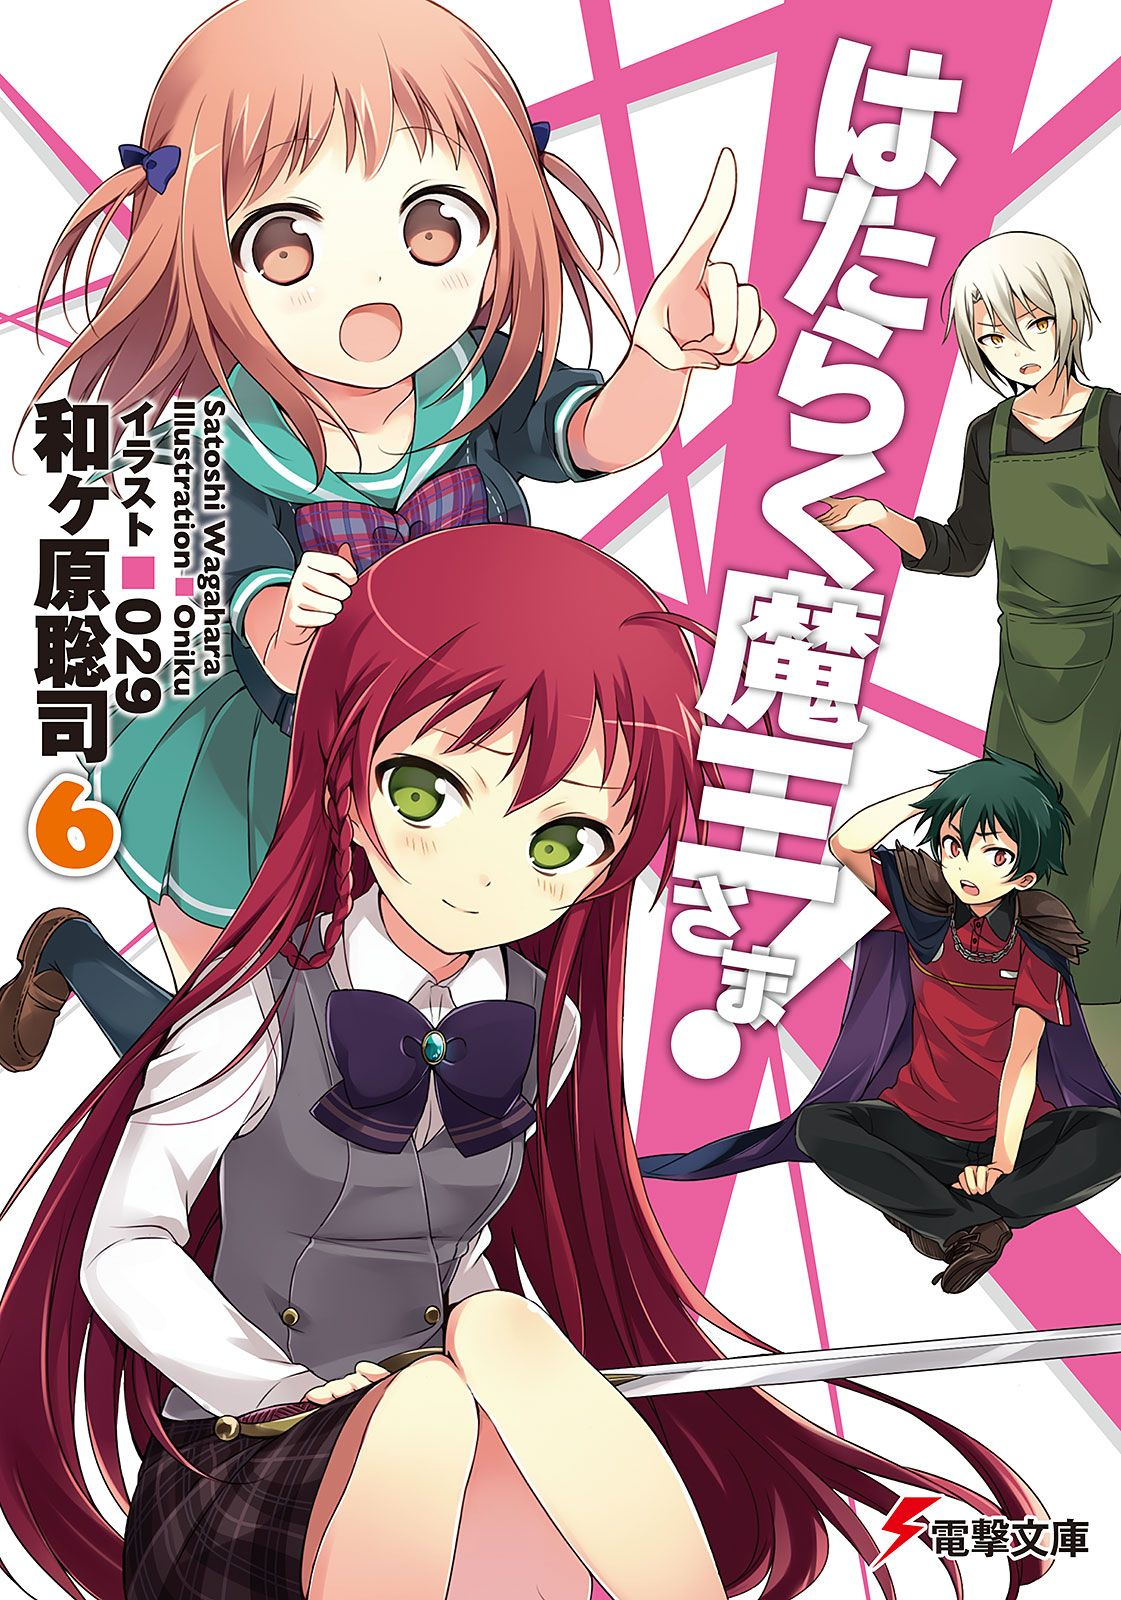 Hataraku Maou Sama Light Novel Volume 6